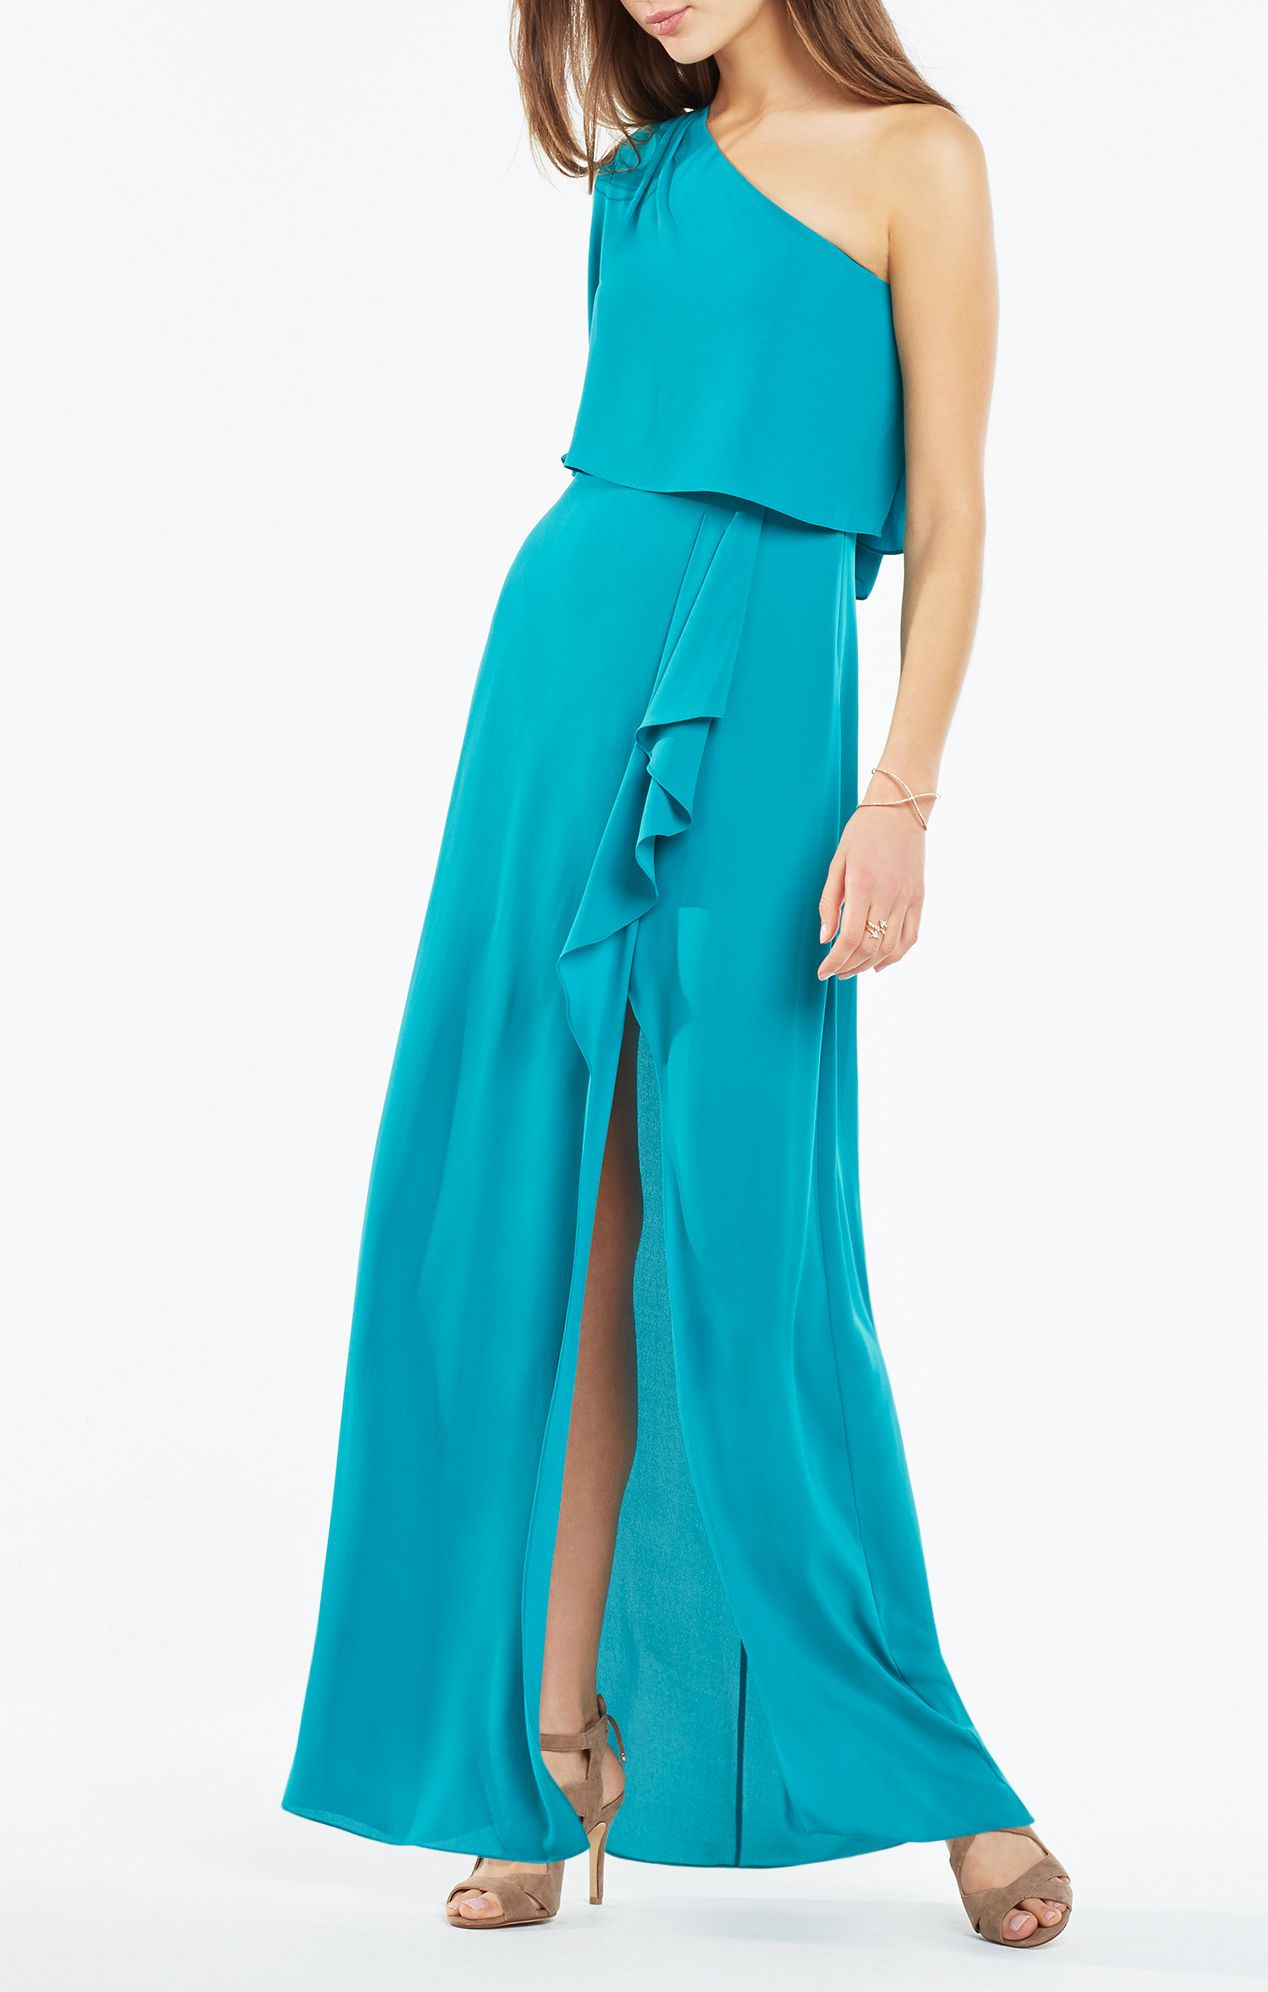 Secha One-Shoulder Draped Gown   MAXImum Potential   Pinterest